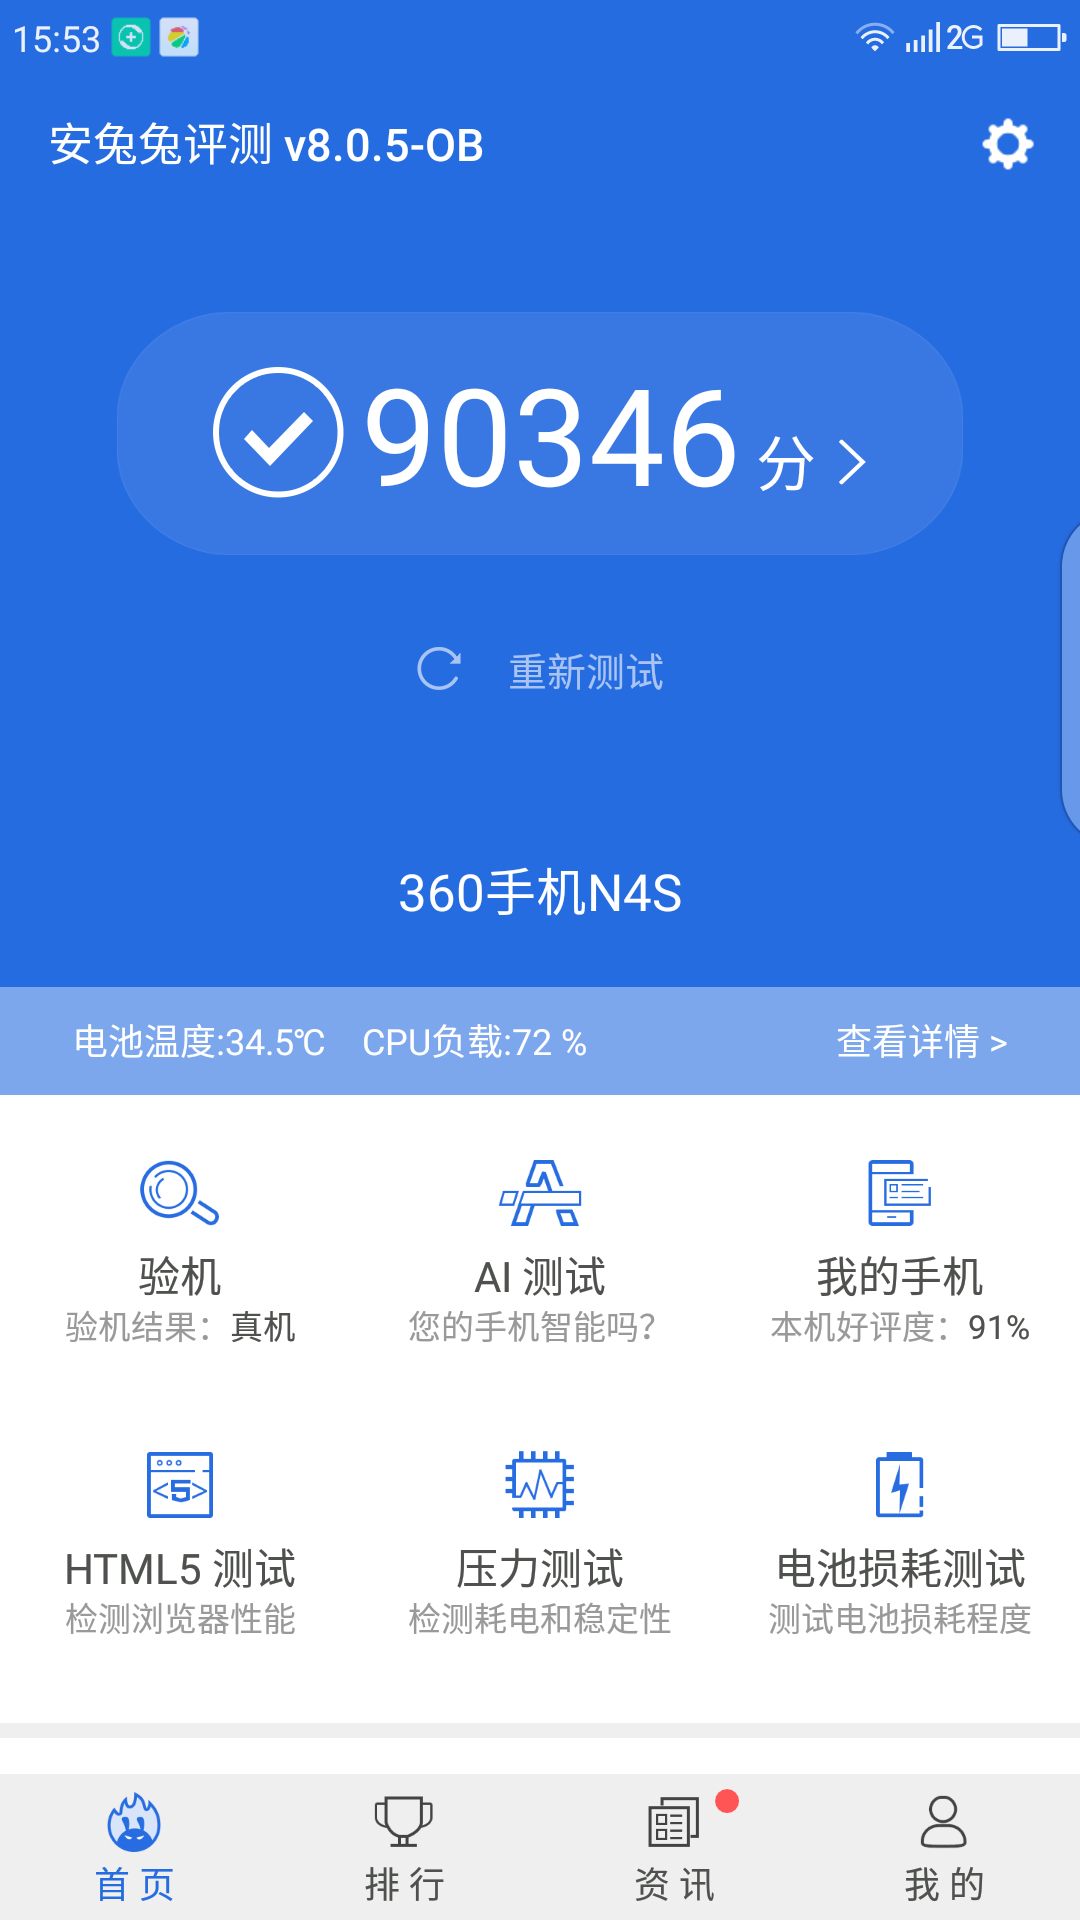 Screenshot_2019-08-15-15-53-05.png